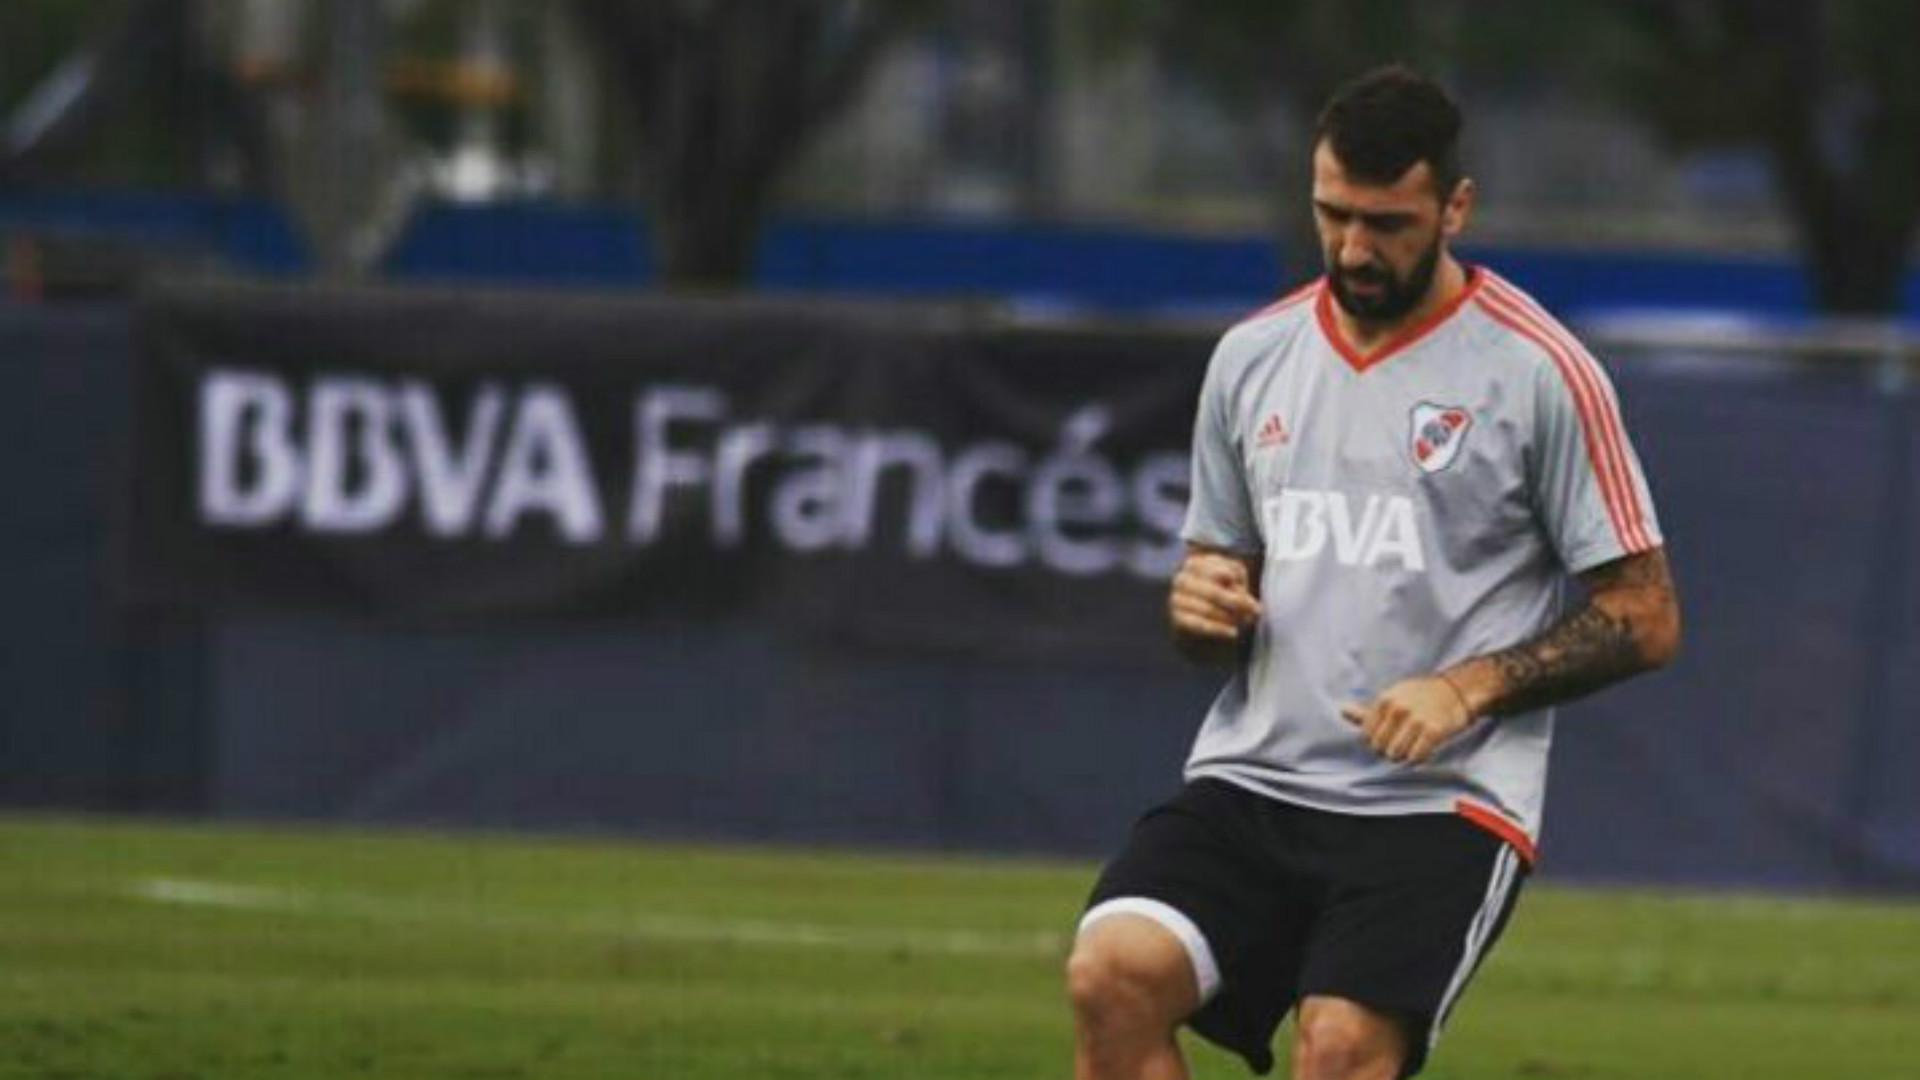 Gran noticia para River: tras ocho meses, Rodrigo Mora volvió al fútbol